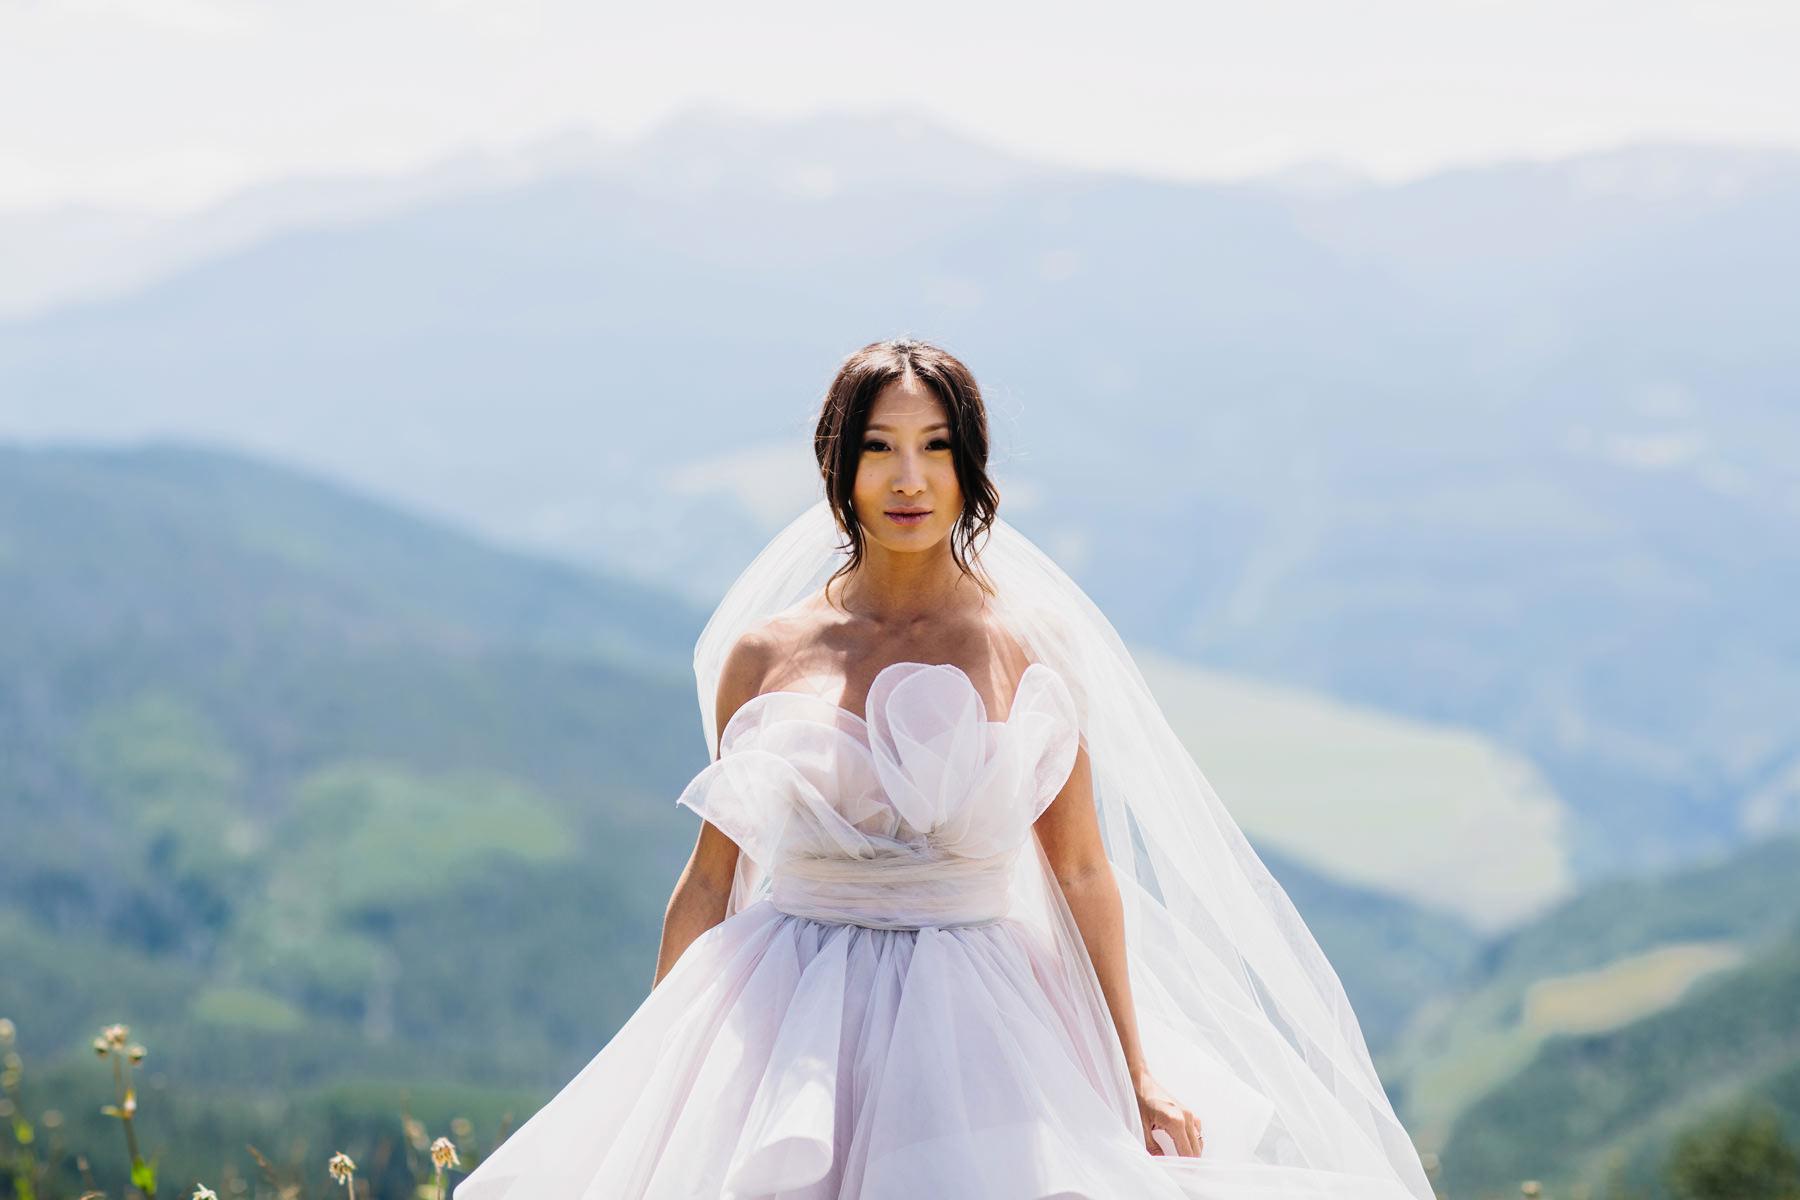 Vail Colorado Wedding Deck_ Kindling Wedding Photography27.JPG